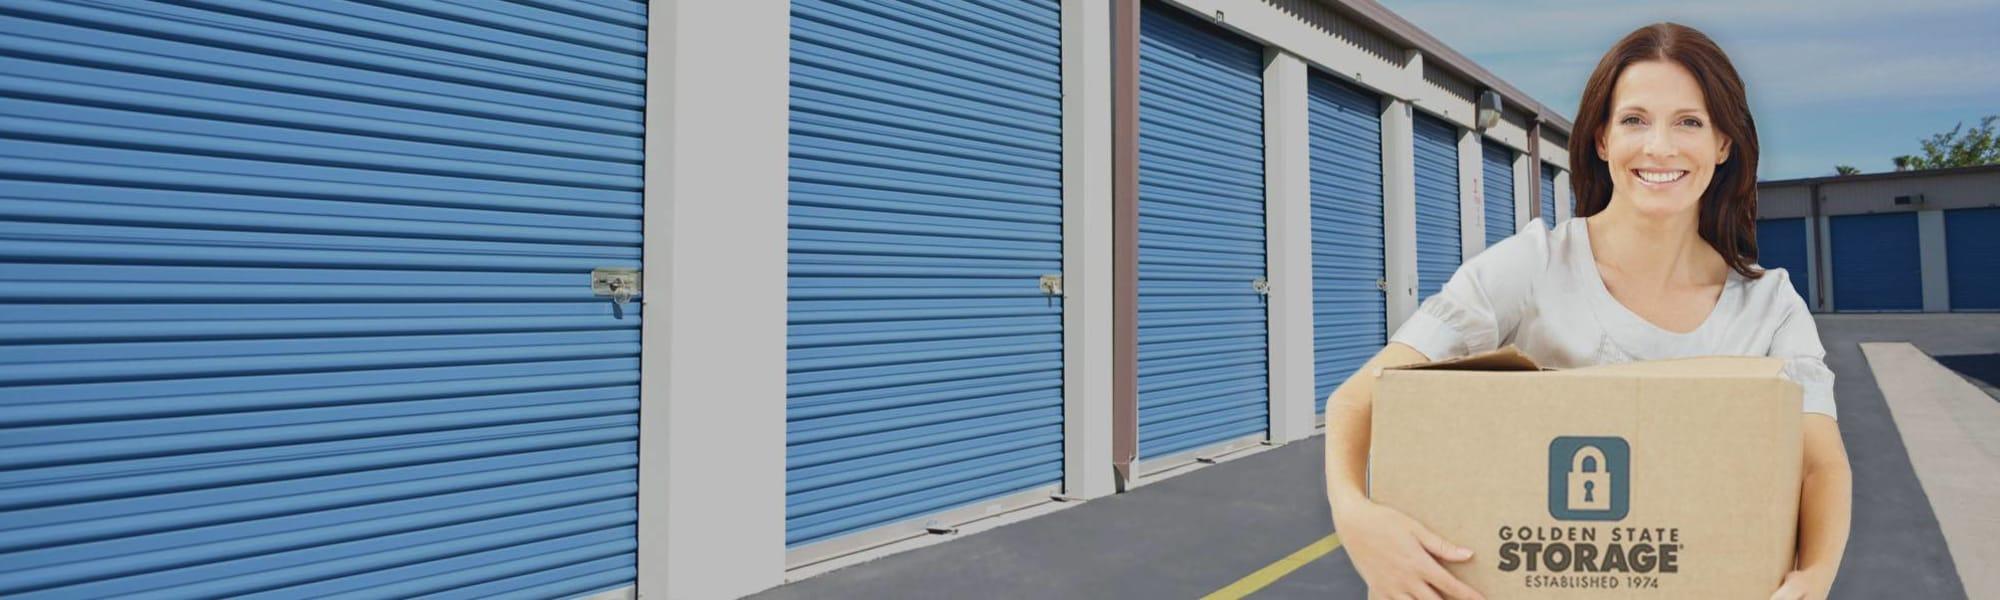 RV & Boat storage at Golden State Storage - Blue Diamond in Las Vegas, Nevada